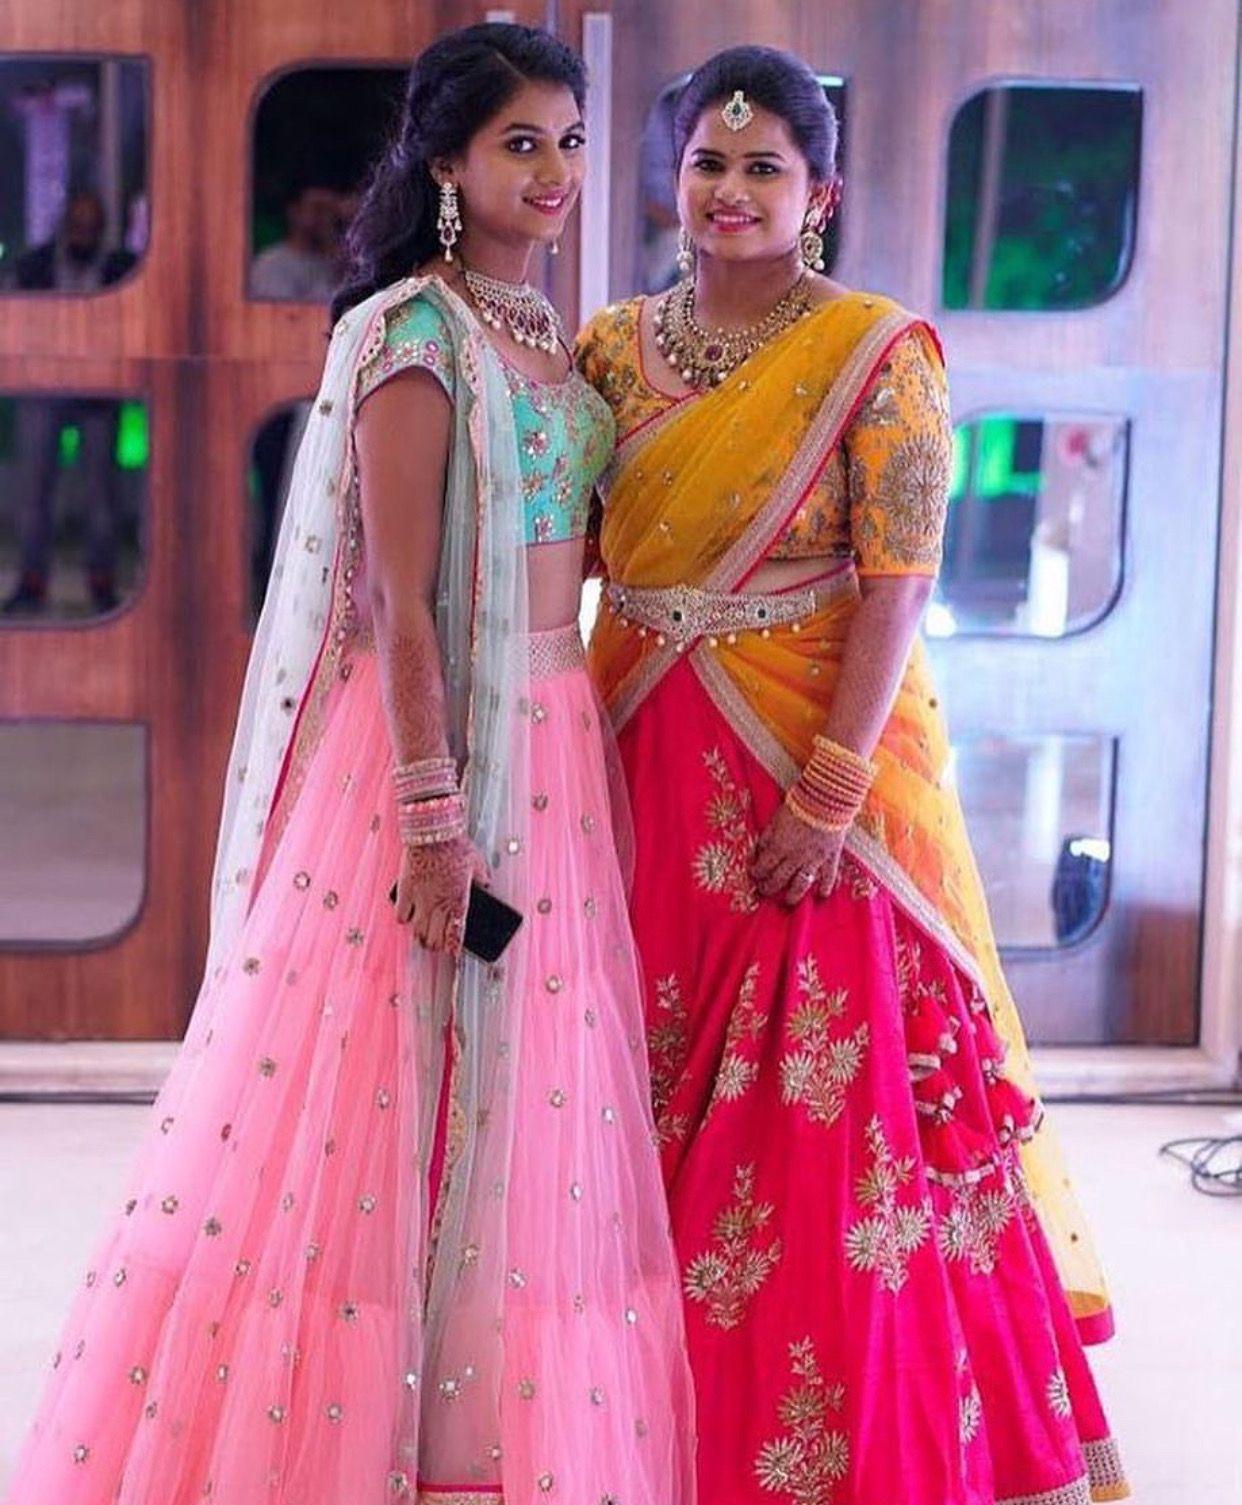 Pin de Aruna Thammisetty en Baby Lehangas & Party ware | Pinterest ...